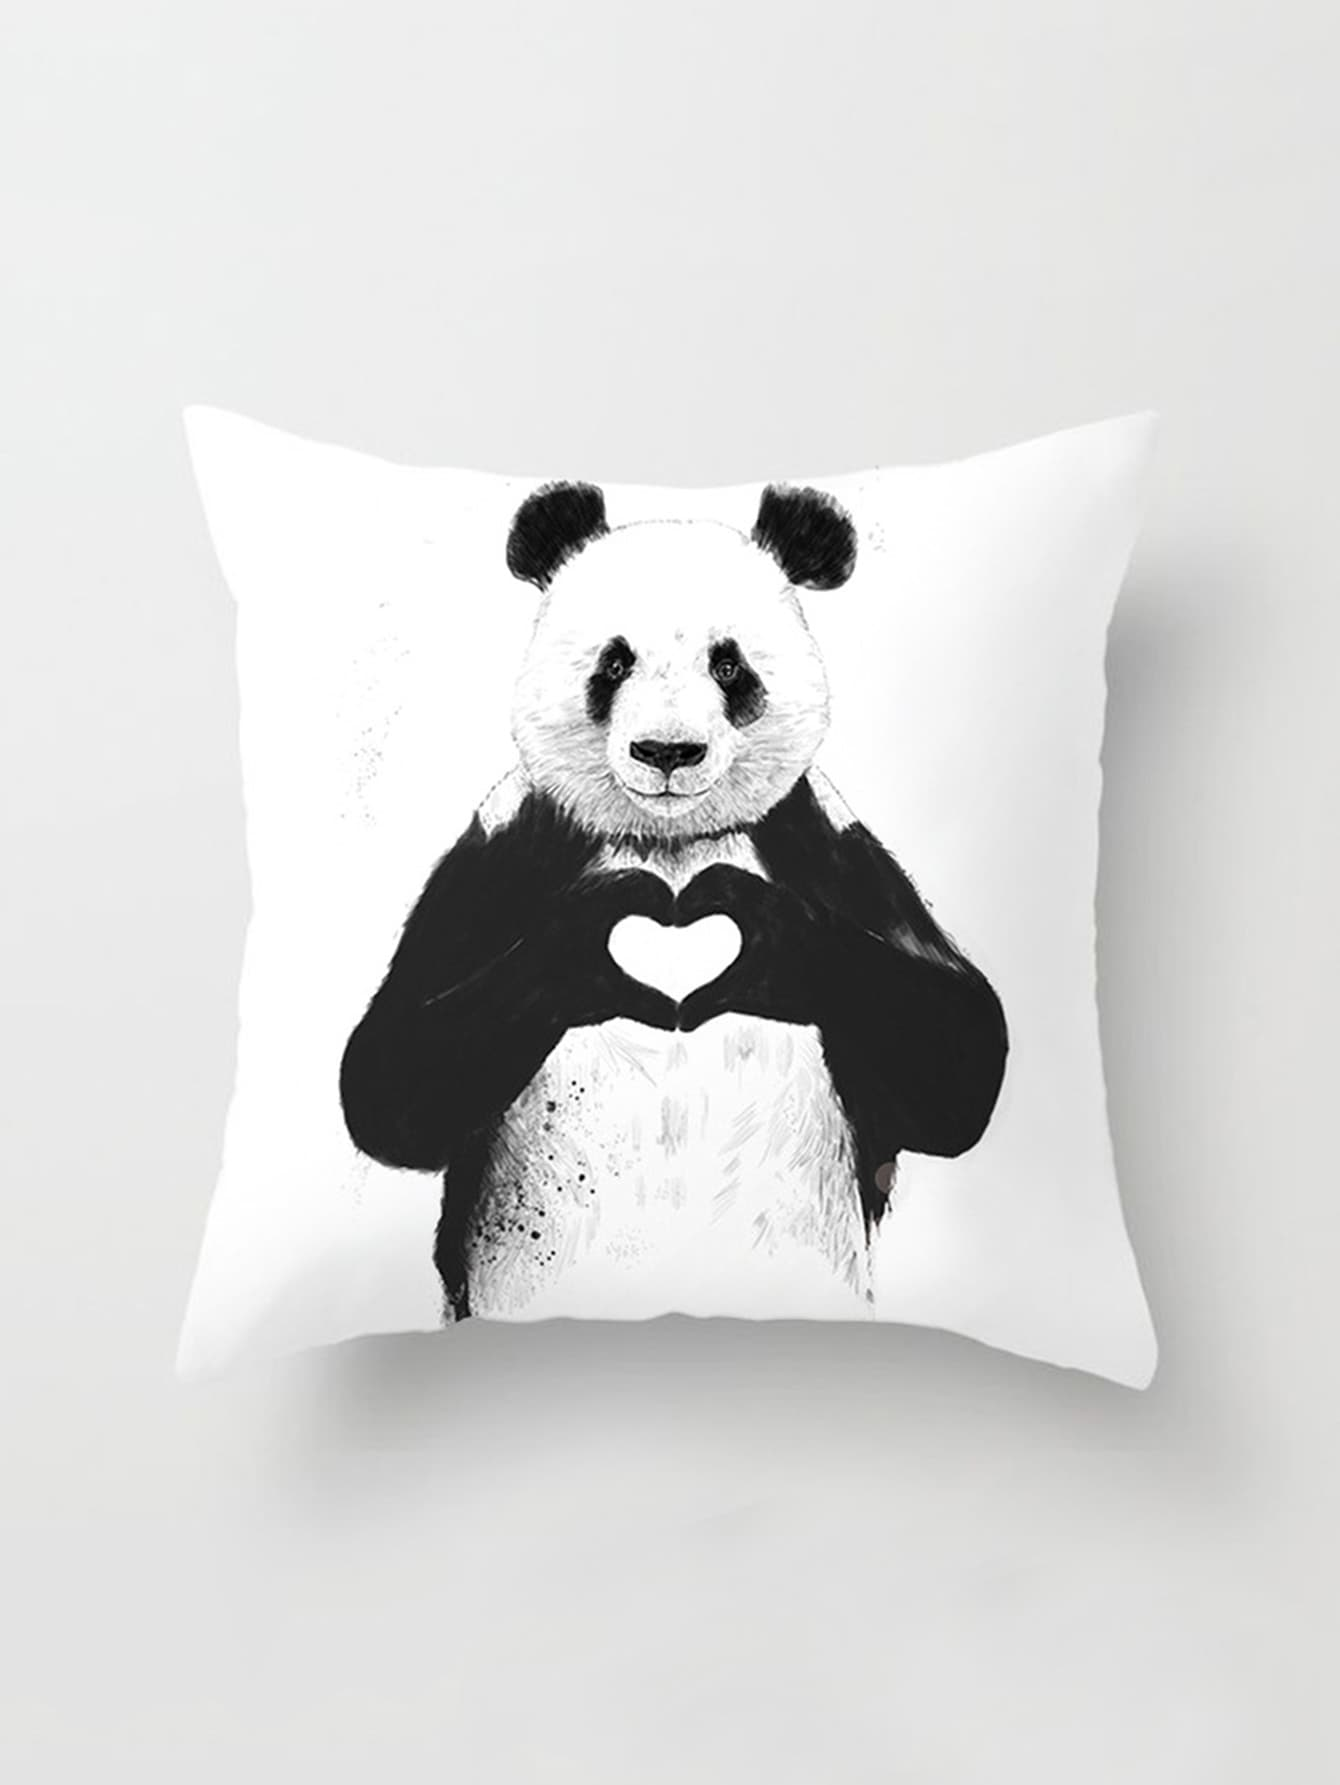 Panda Print Linen Pillowcase Cover